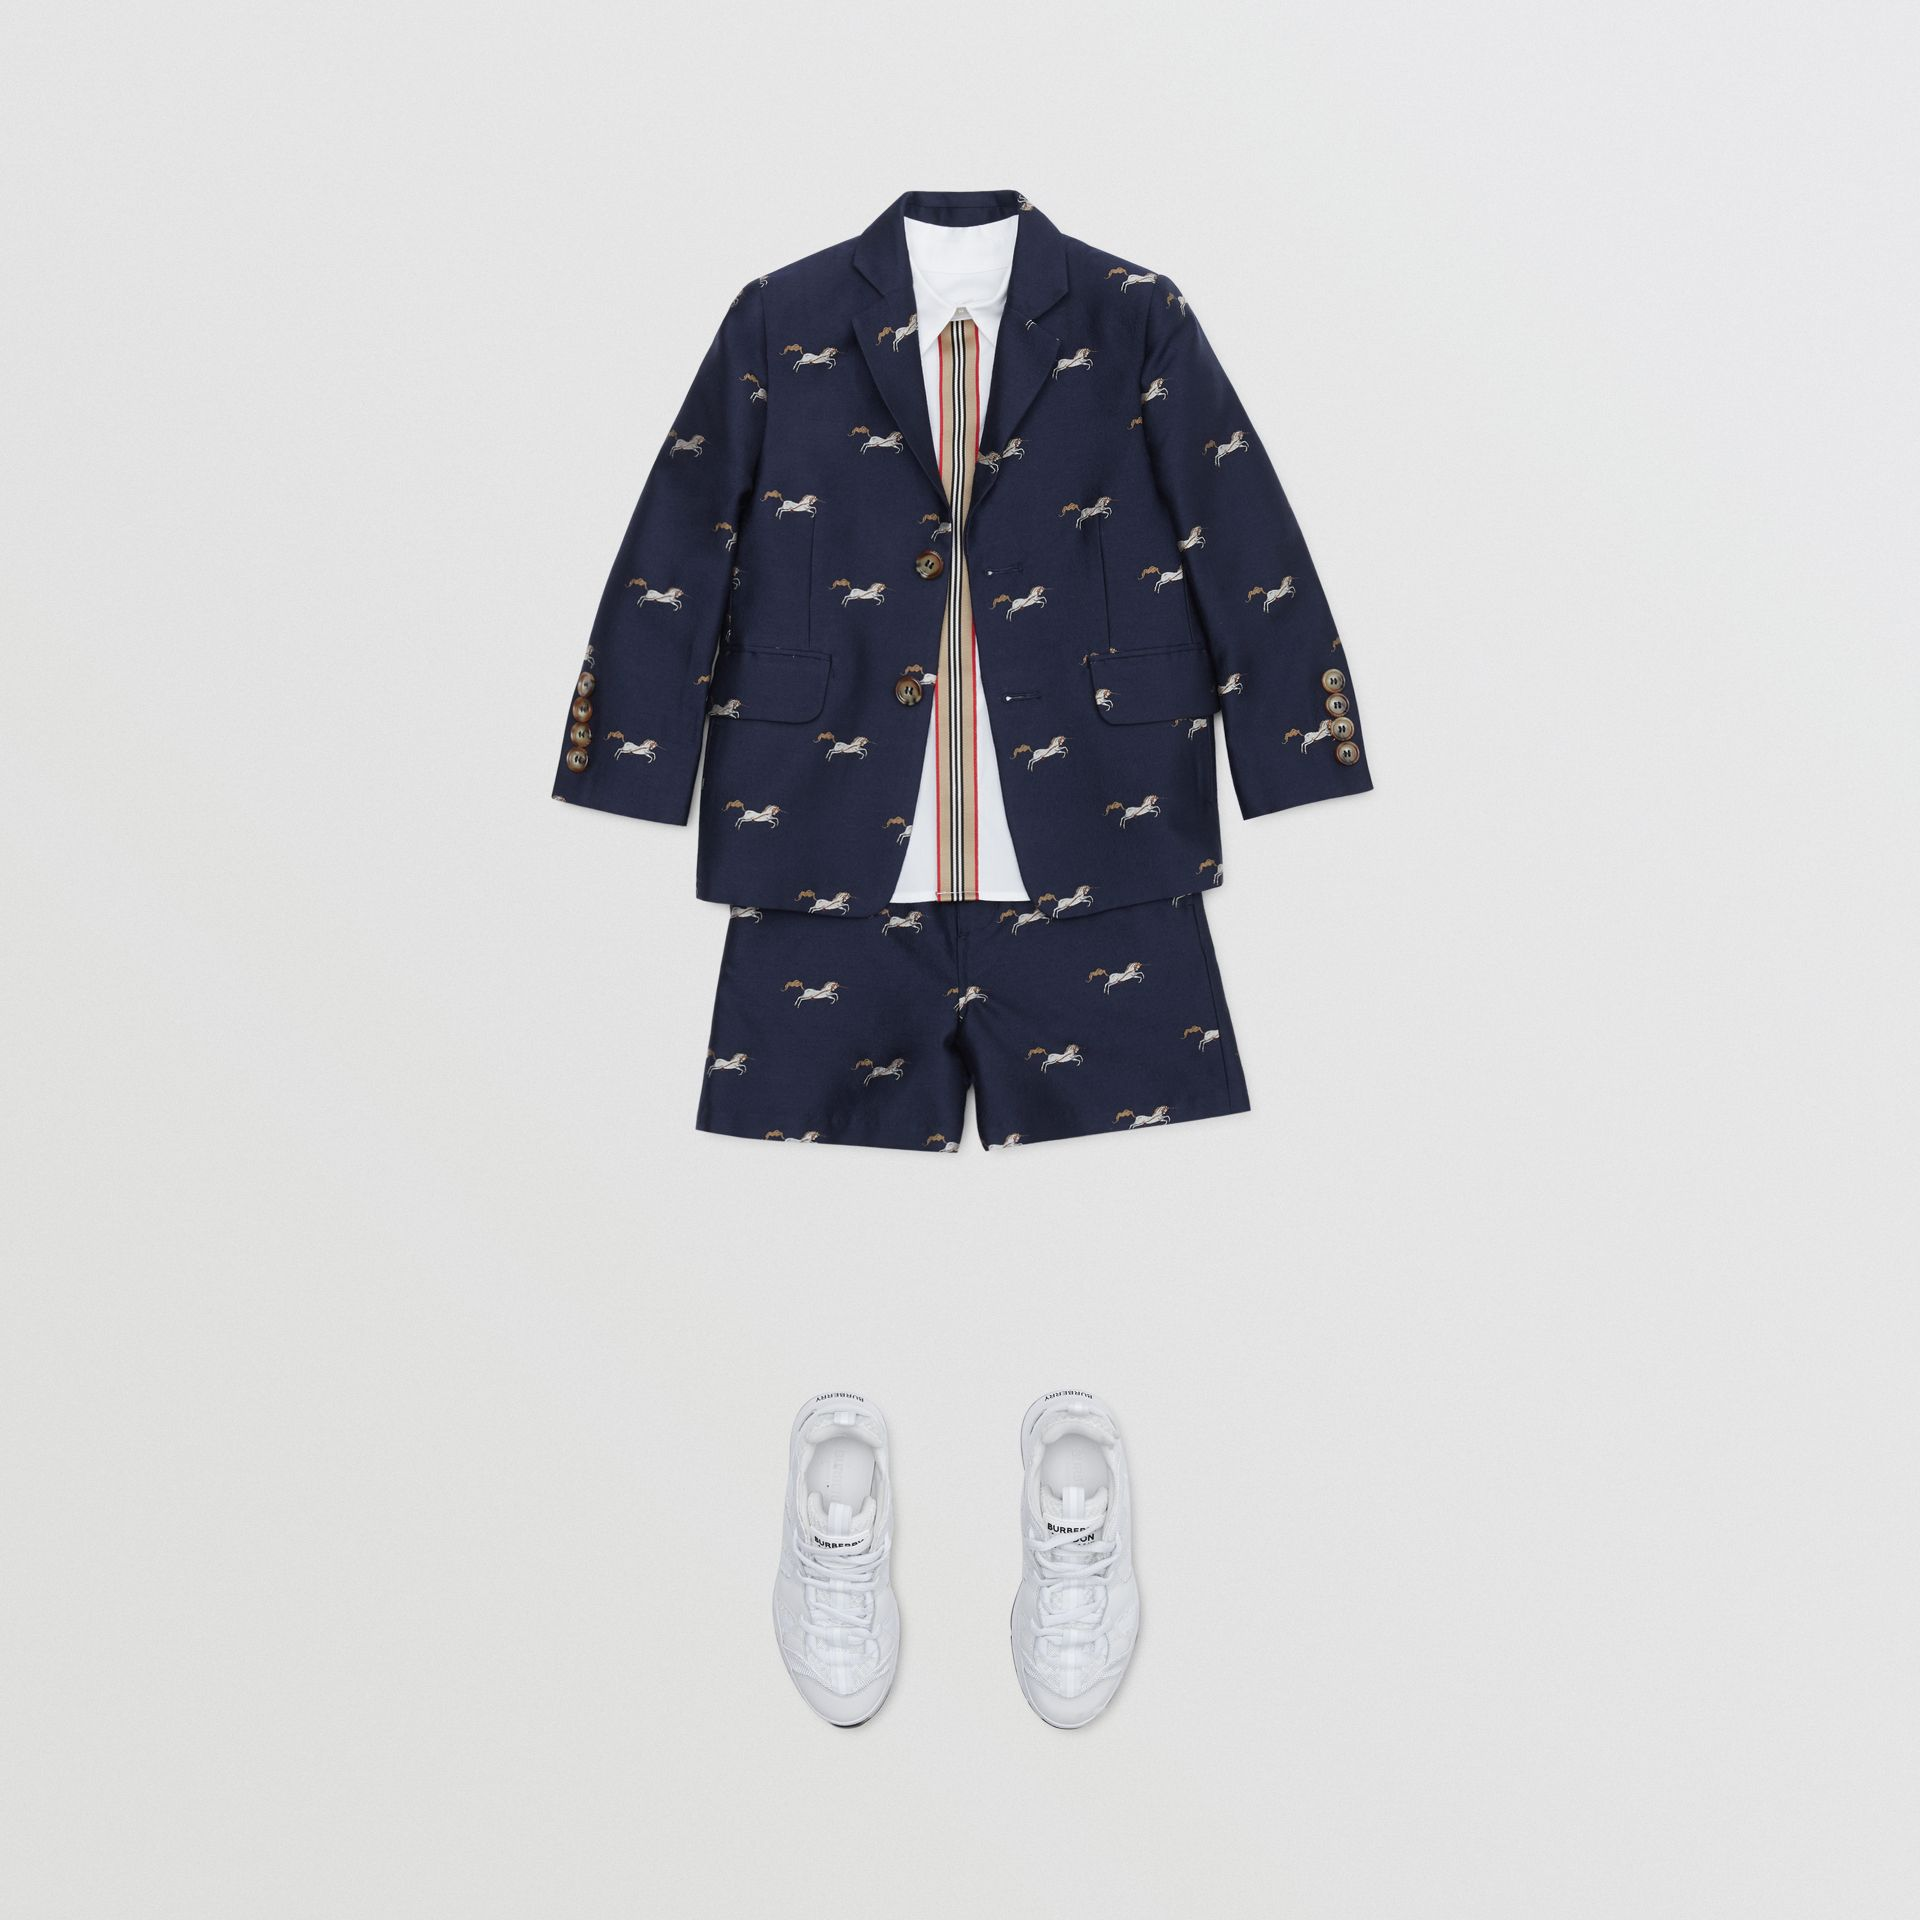 Unicorn Wool Silk Jacquard Blazer in Navy   Burberry United Kingdom - gallery image 2